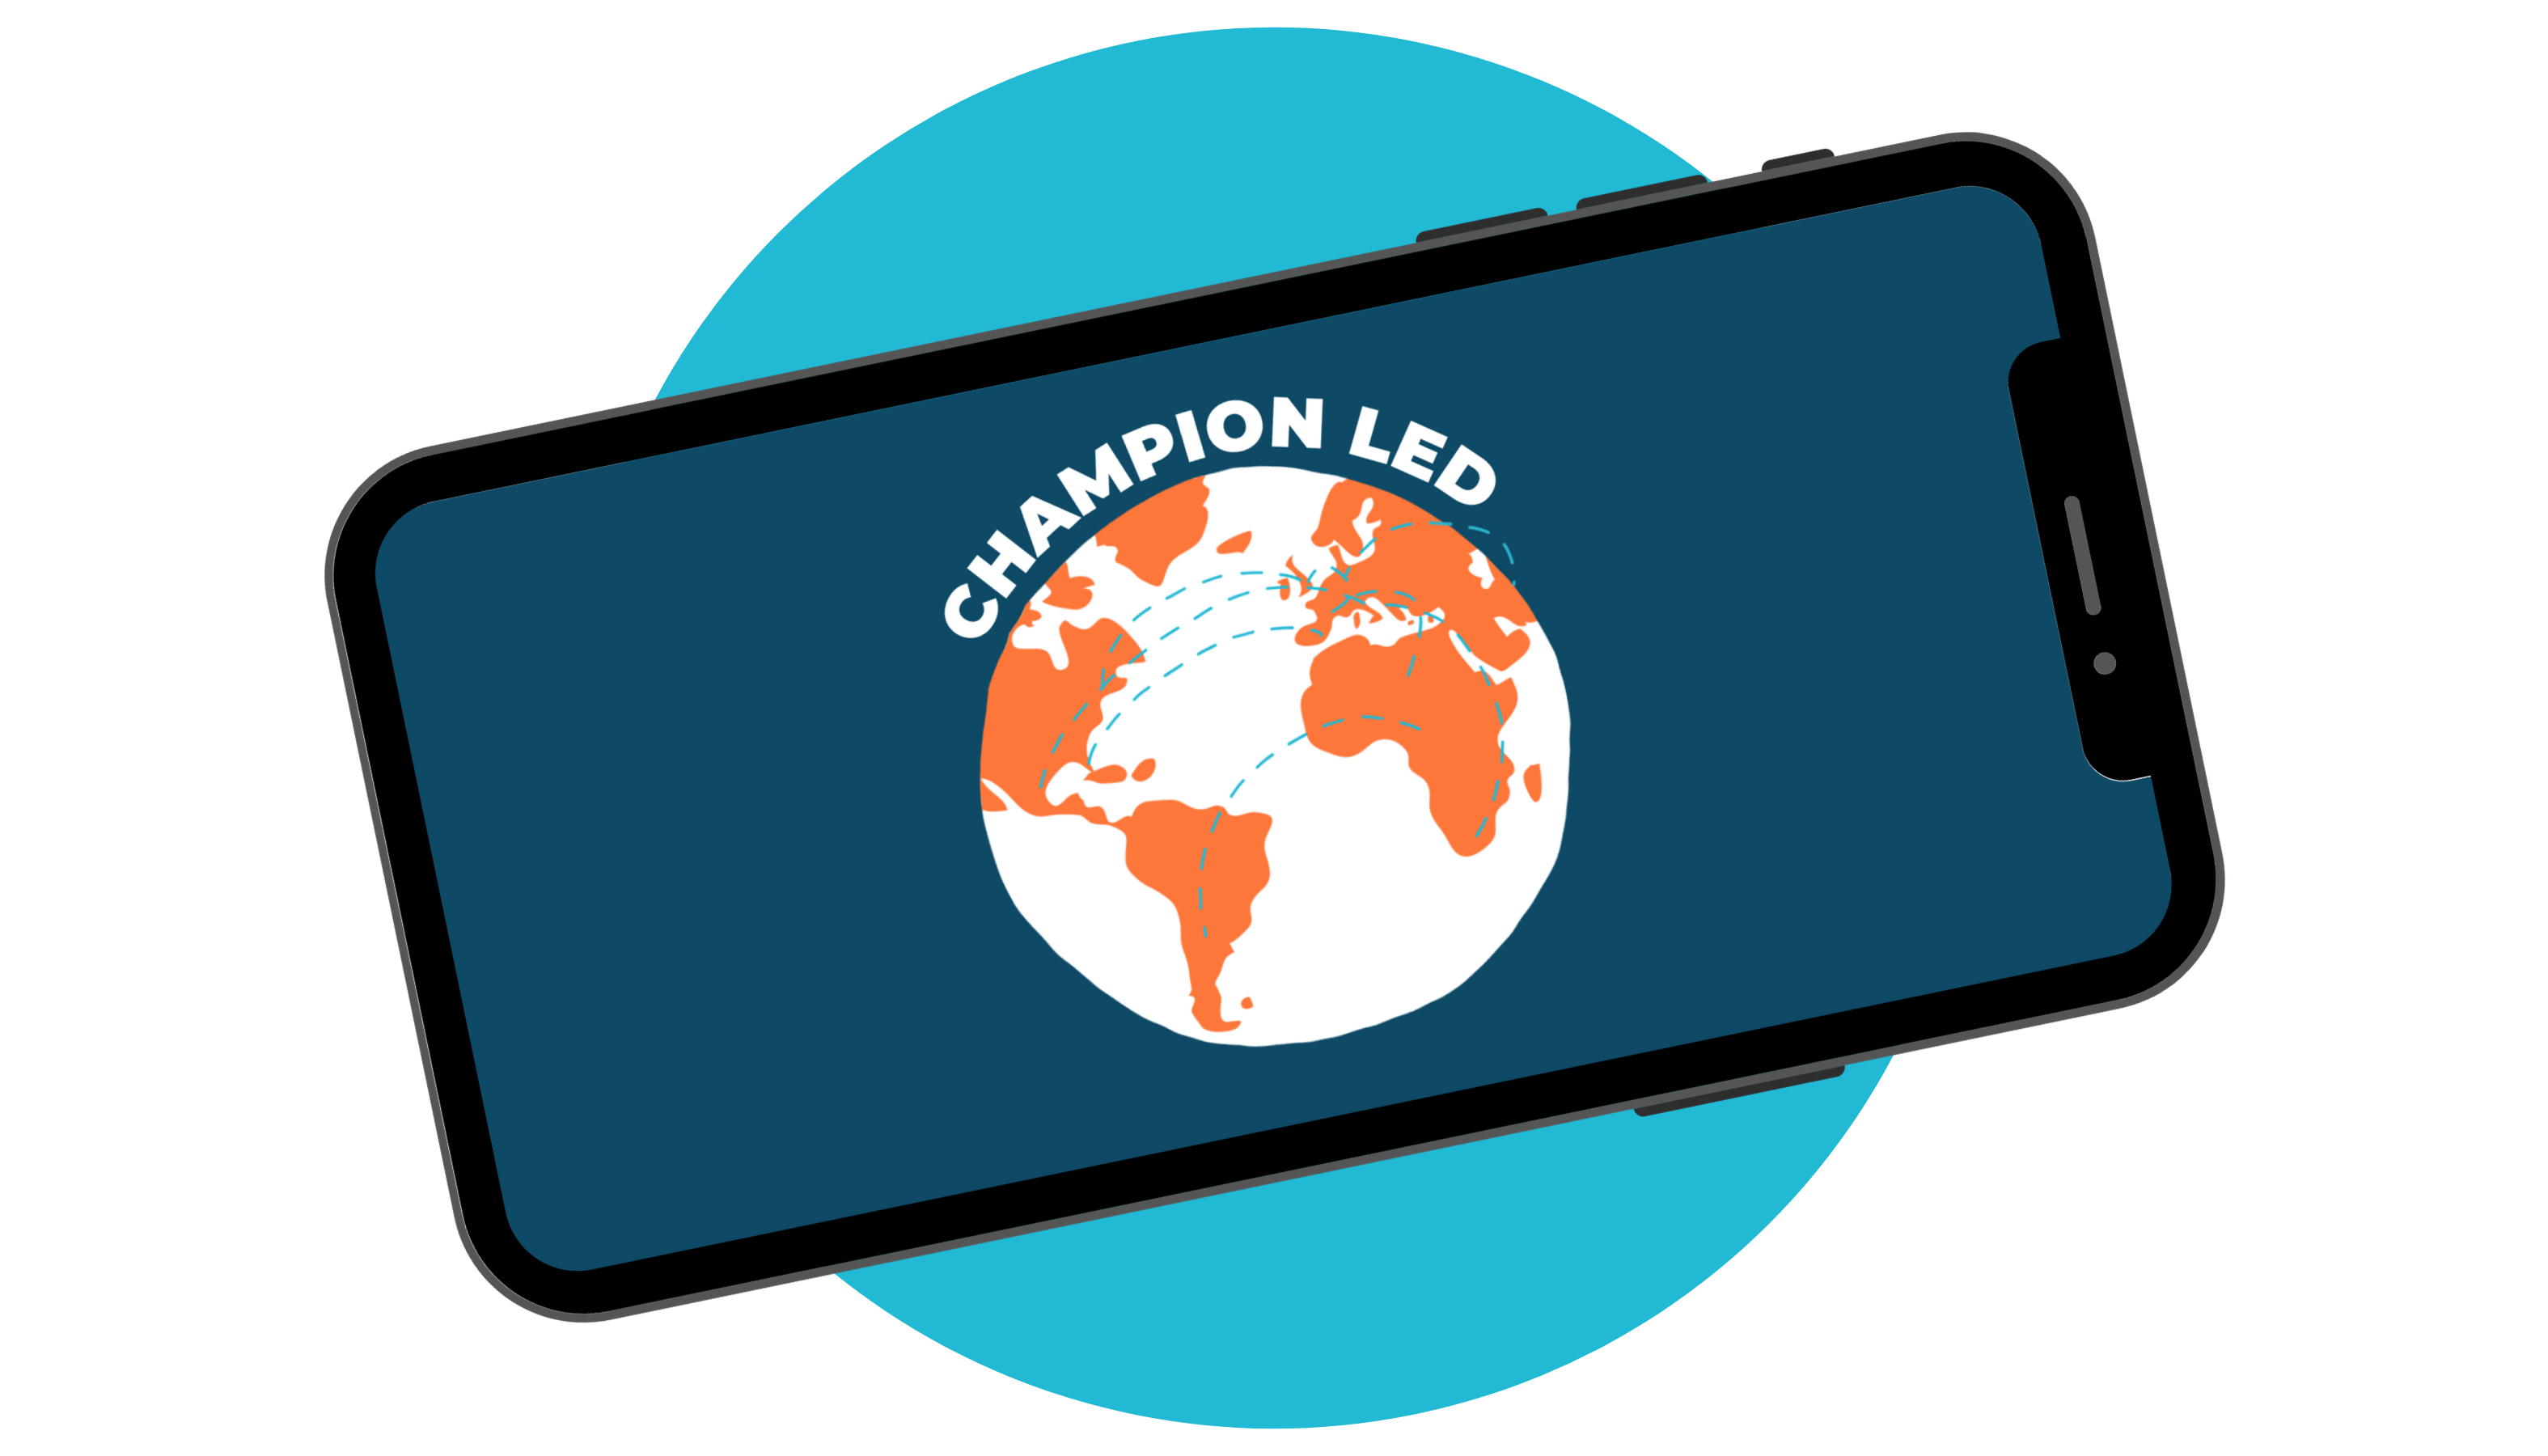 Champion Led logo on a phone